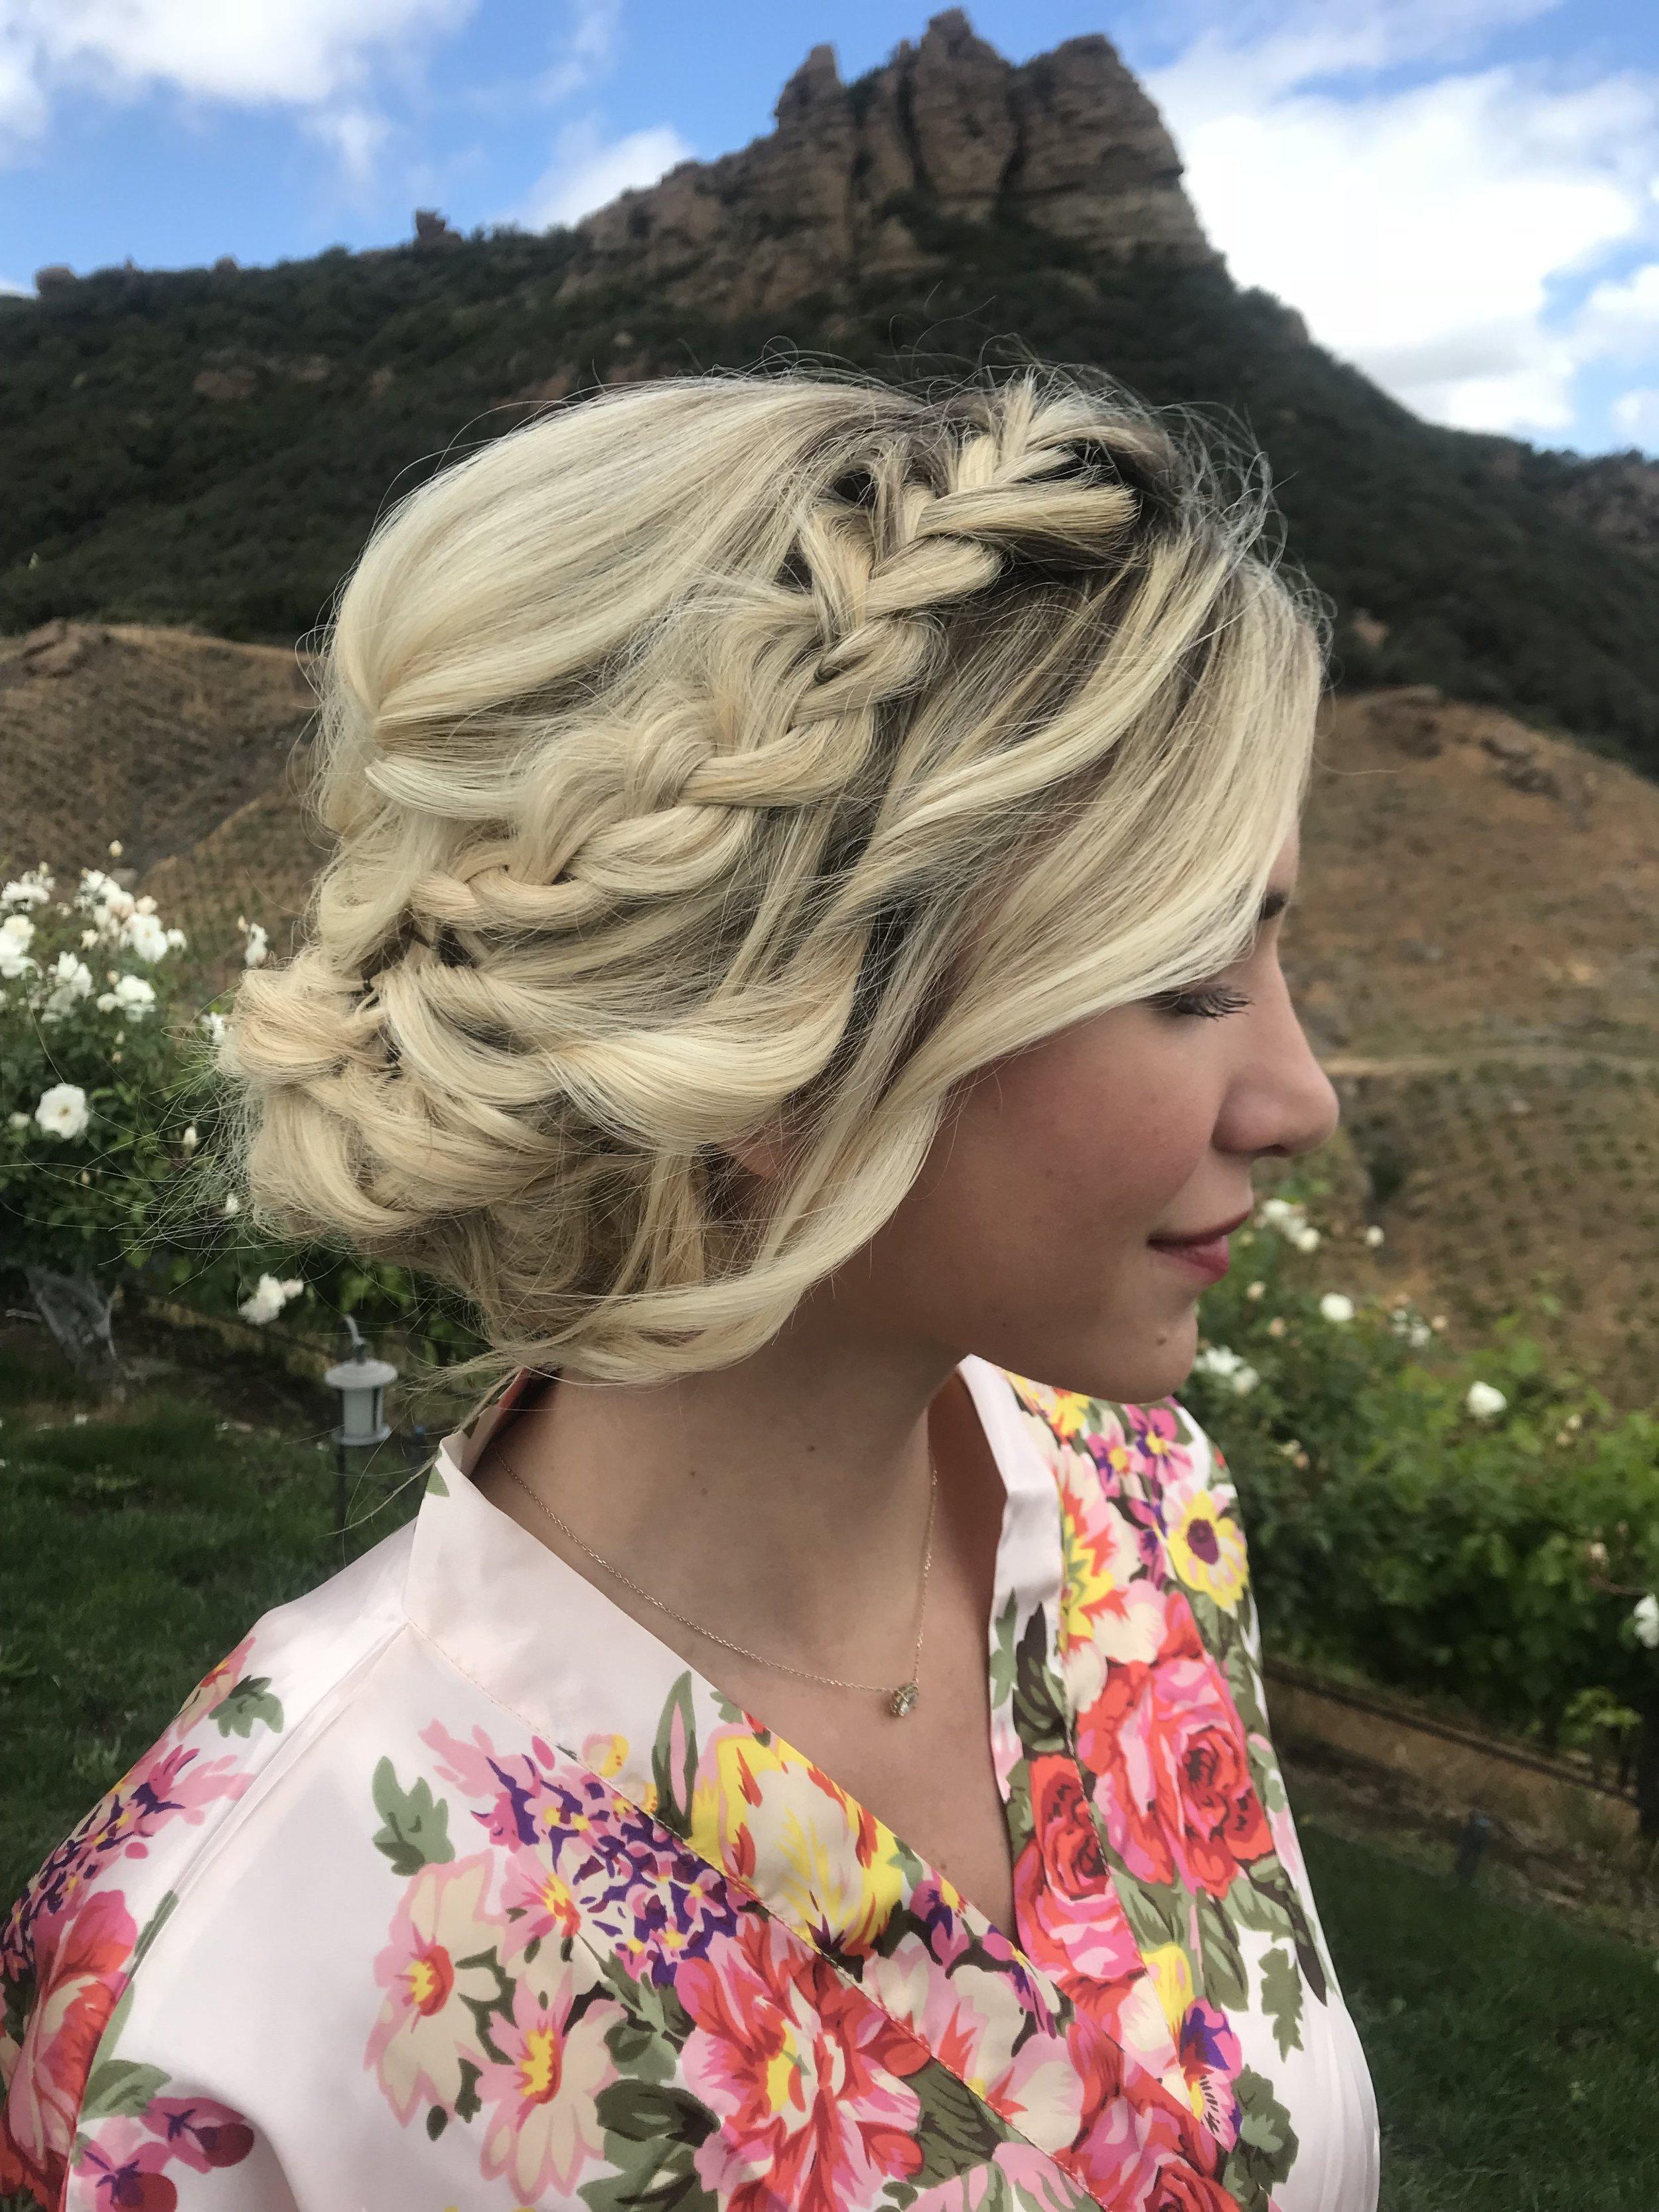 Blonde Braided Bridal Updo with Curls.jpg